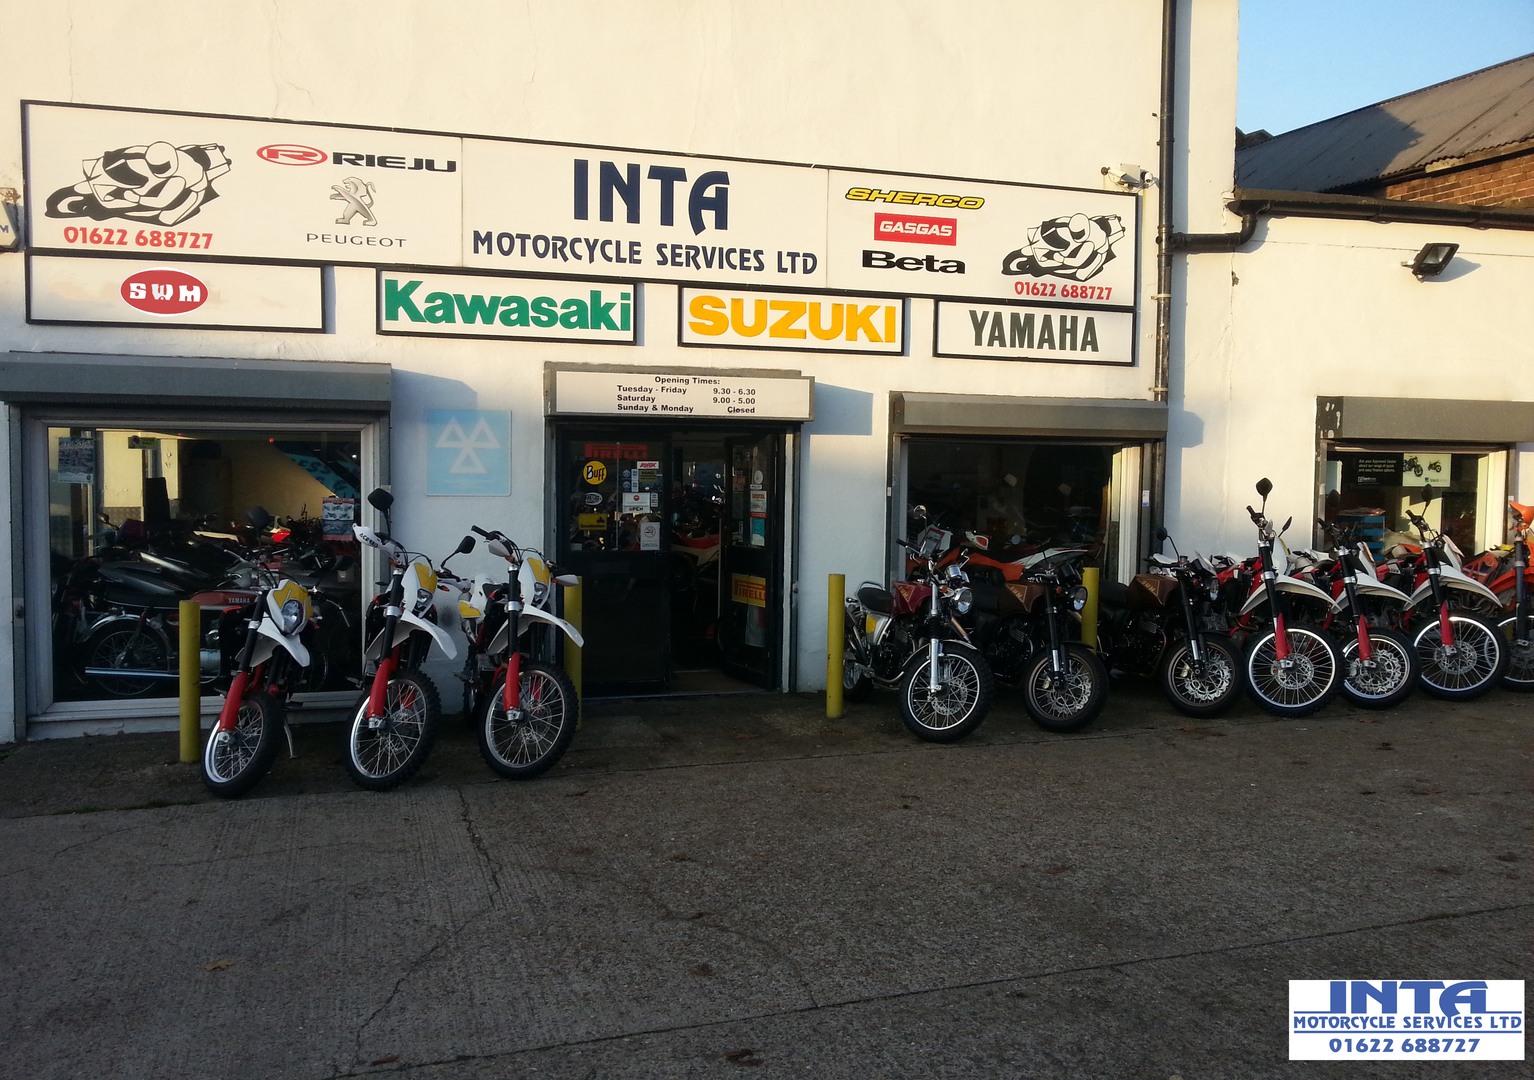 Inta Motorcycle Services Ltd